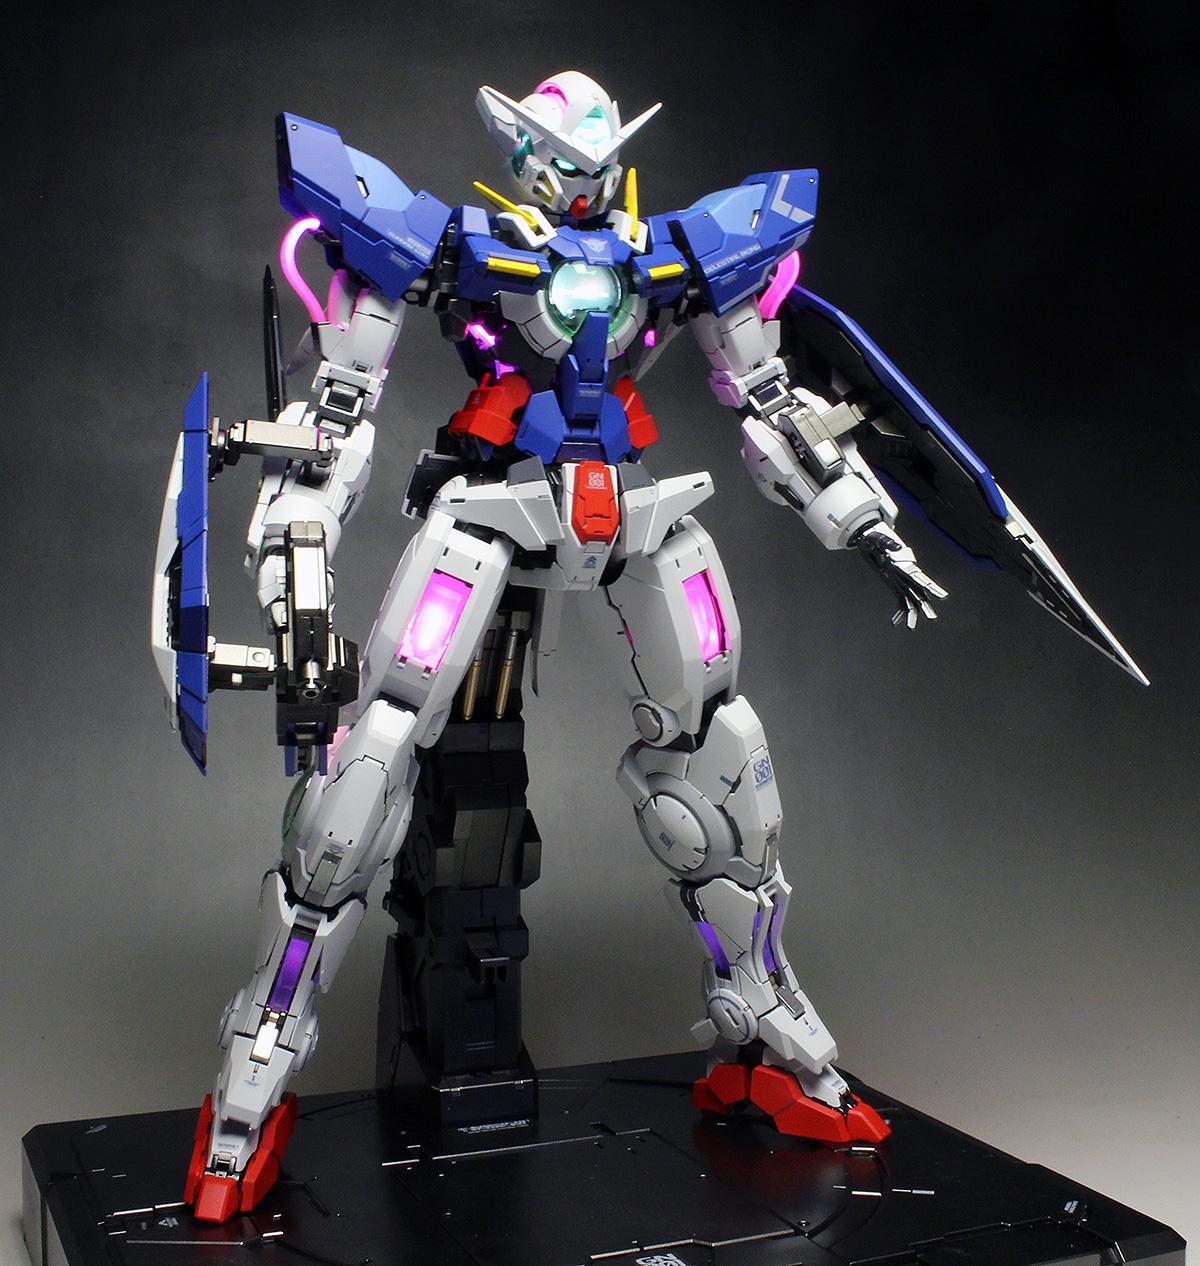 METAL BUILD 1/100 Gundam Exia Repair I & II Preview ...  |Gundam Exia